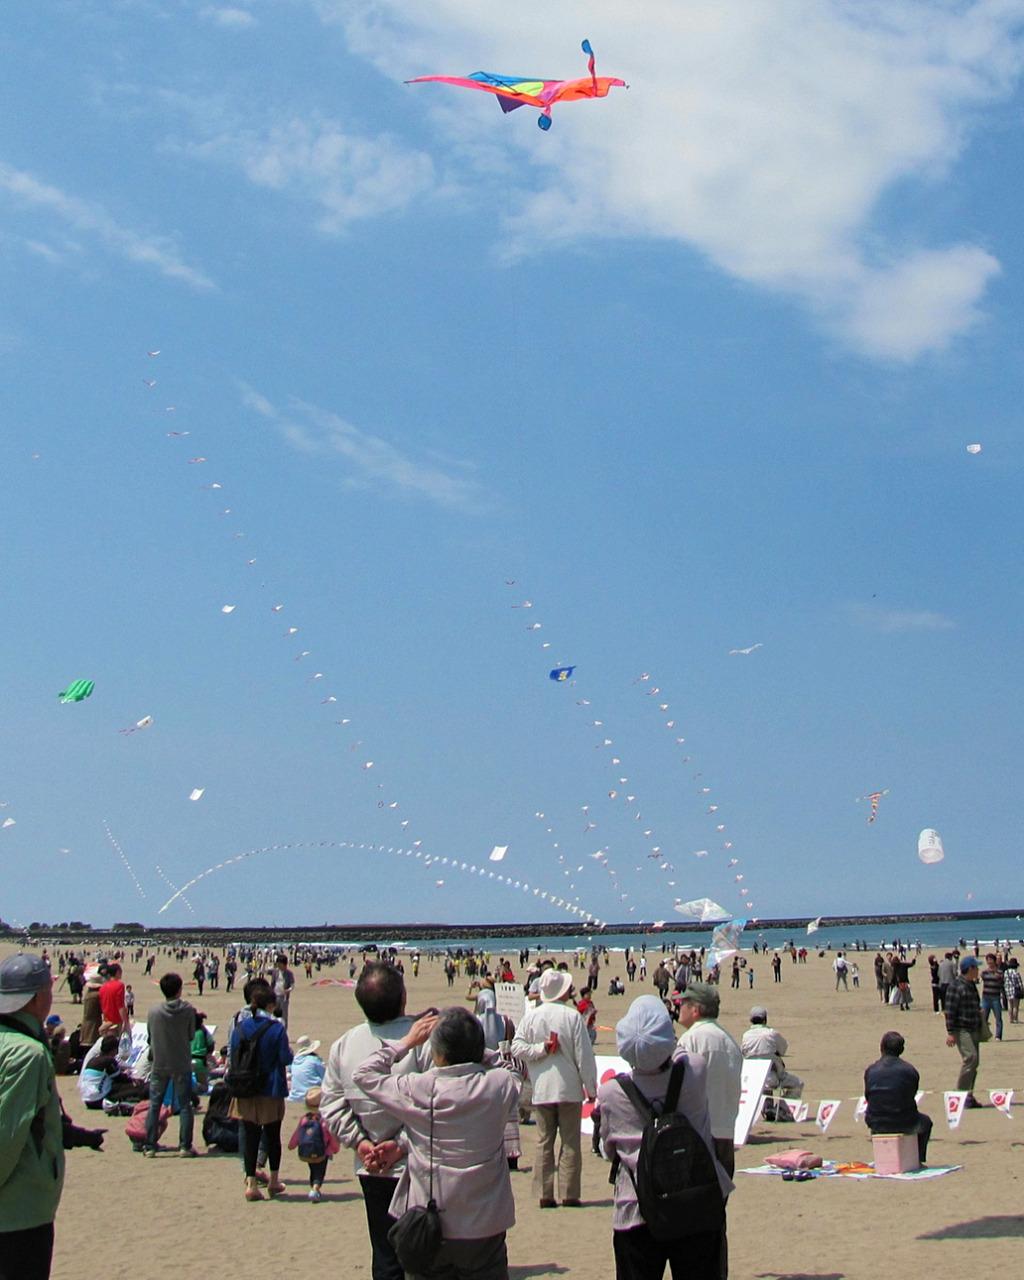 Uchinada Kite Festival, by rlquinn1980 on Flickr